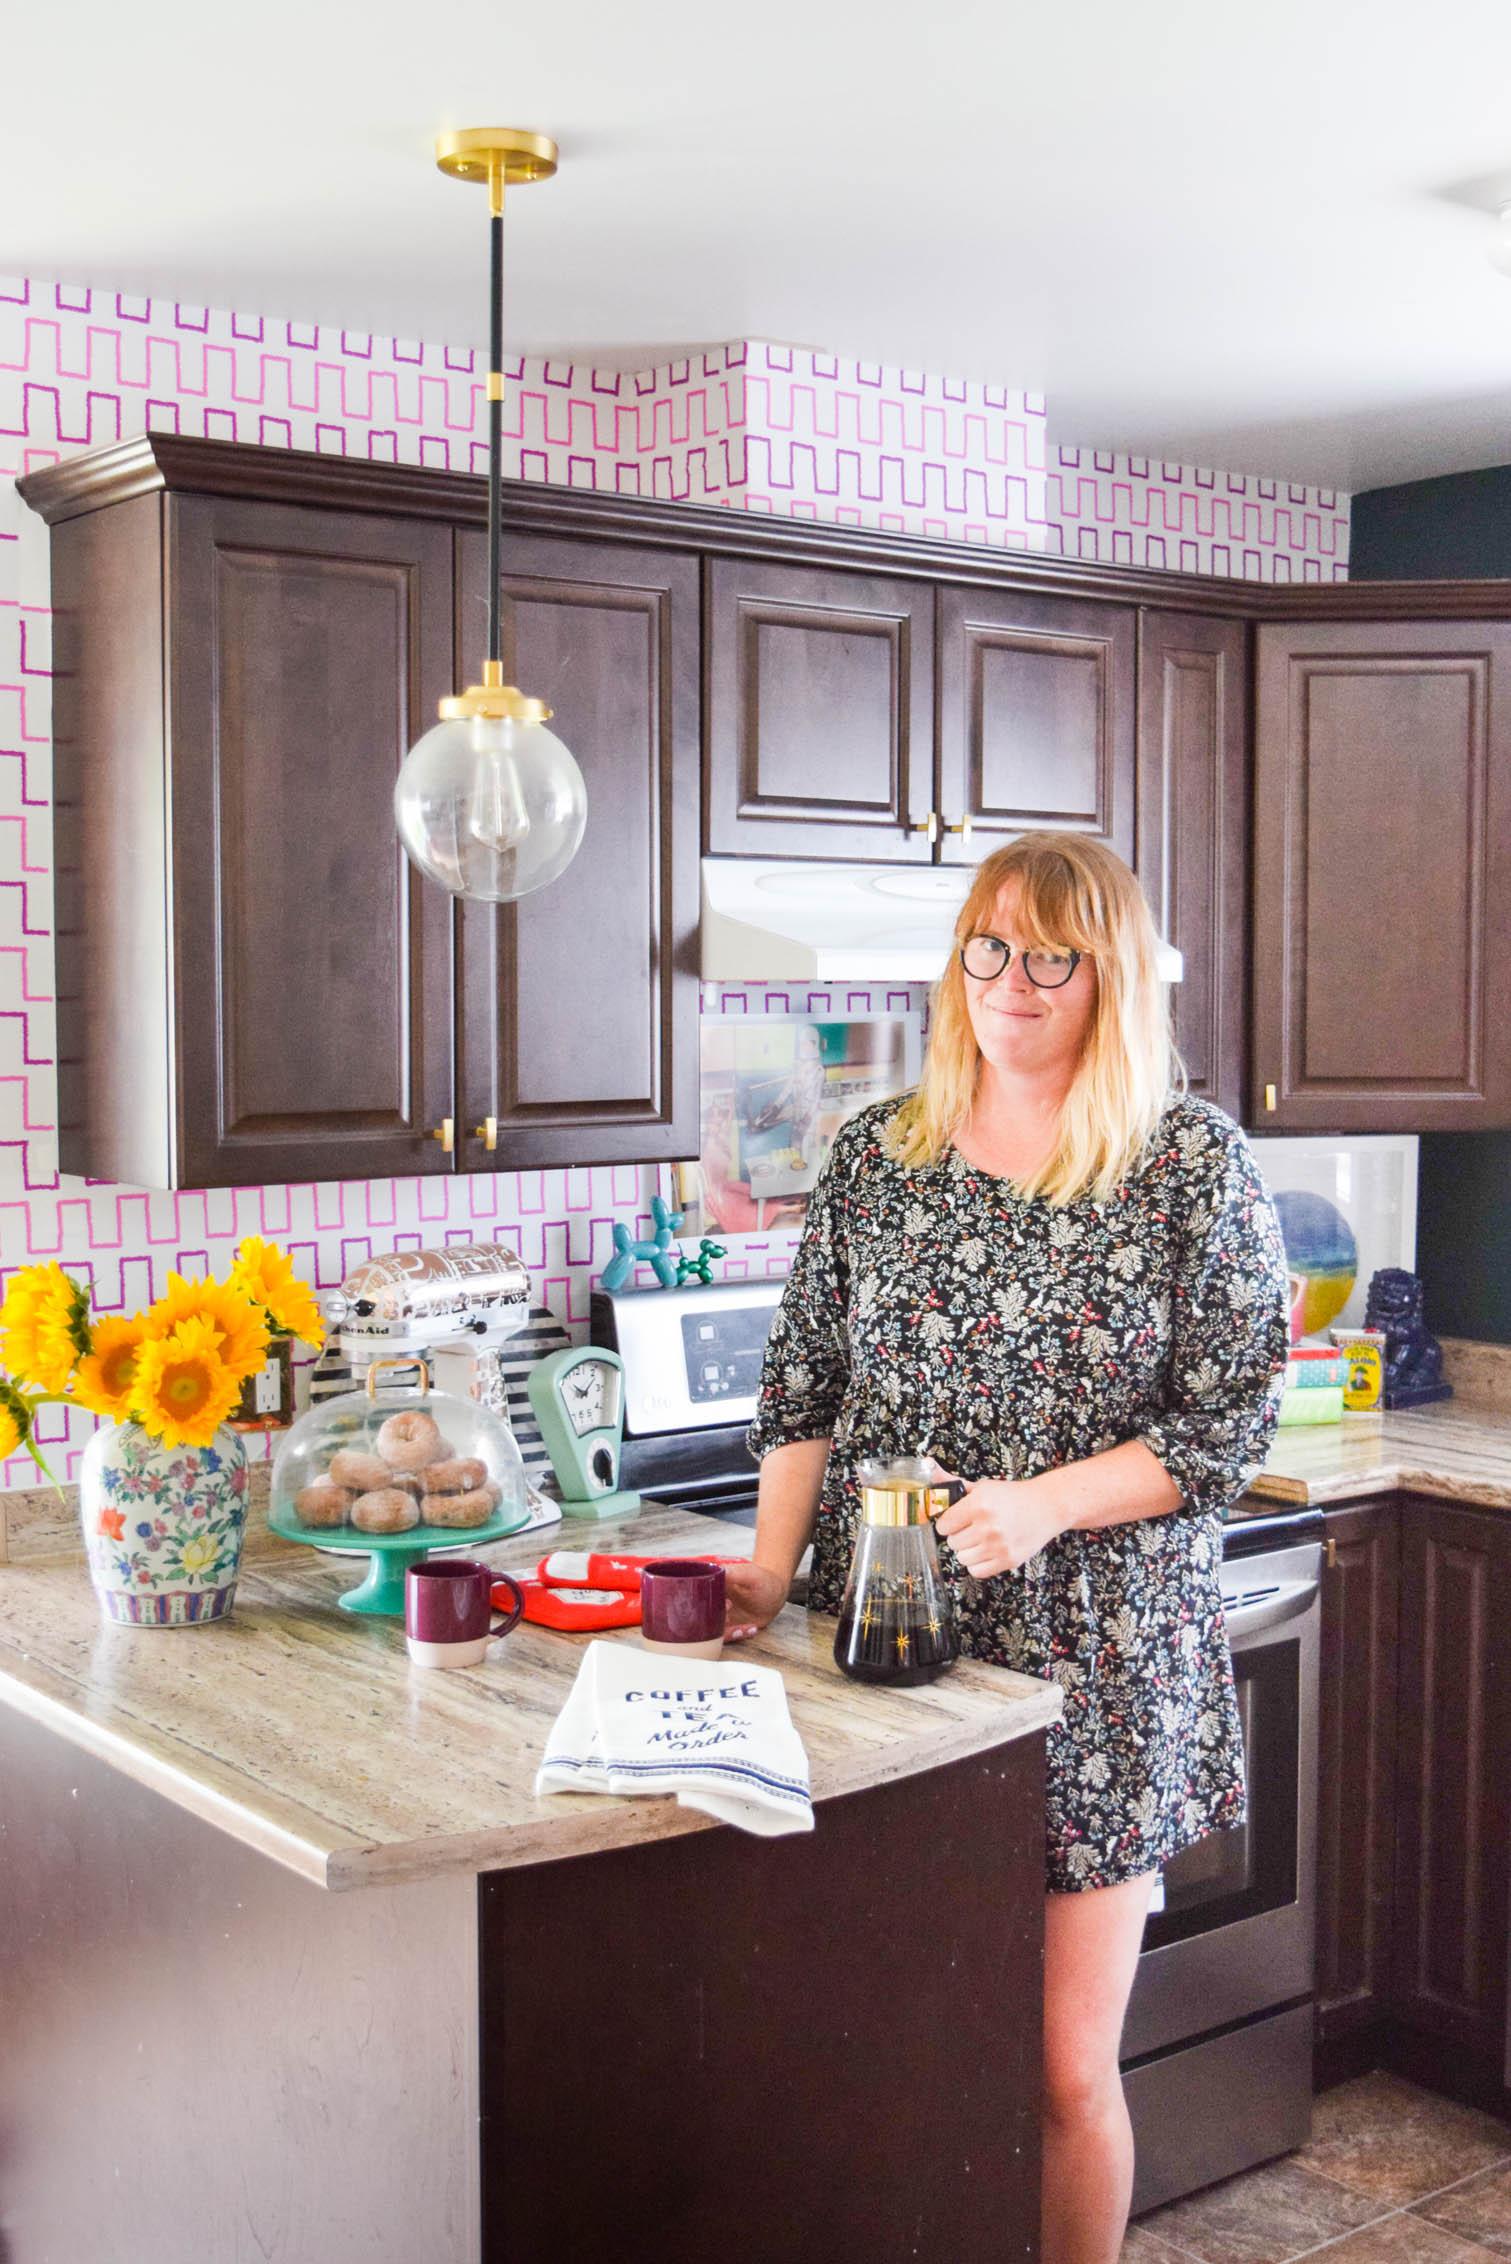 Removable Kitchen Wallpaper Backsplash • PMQ for two